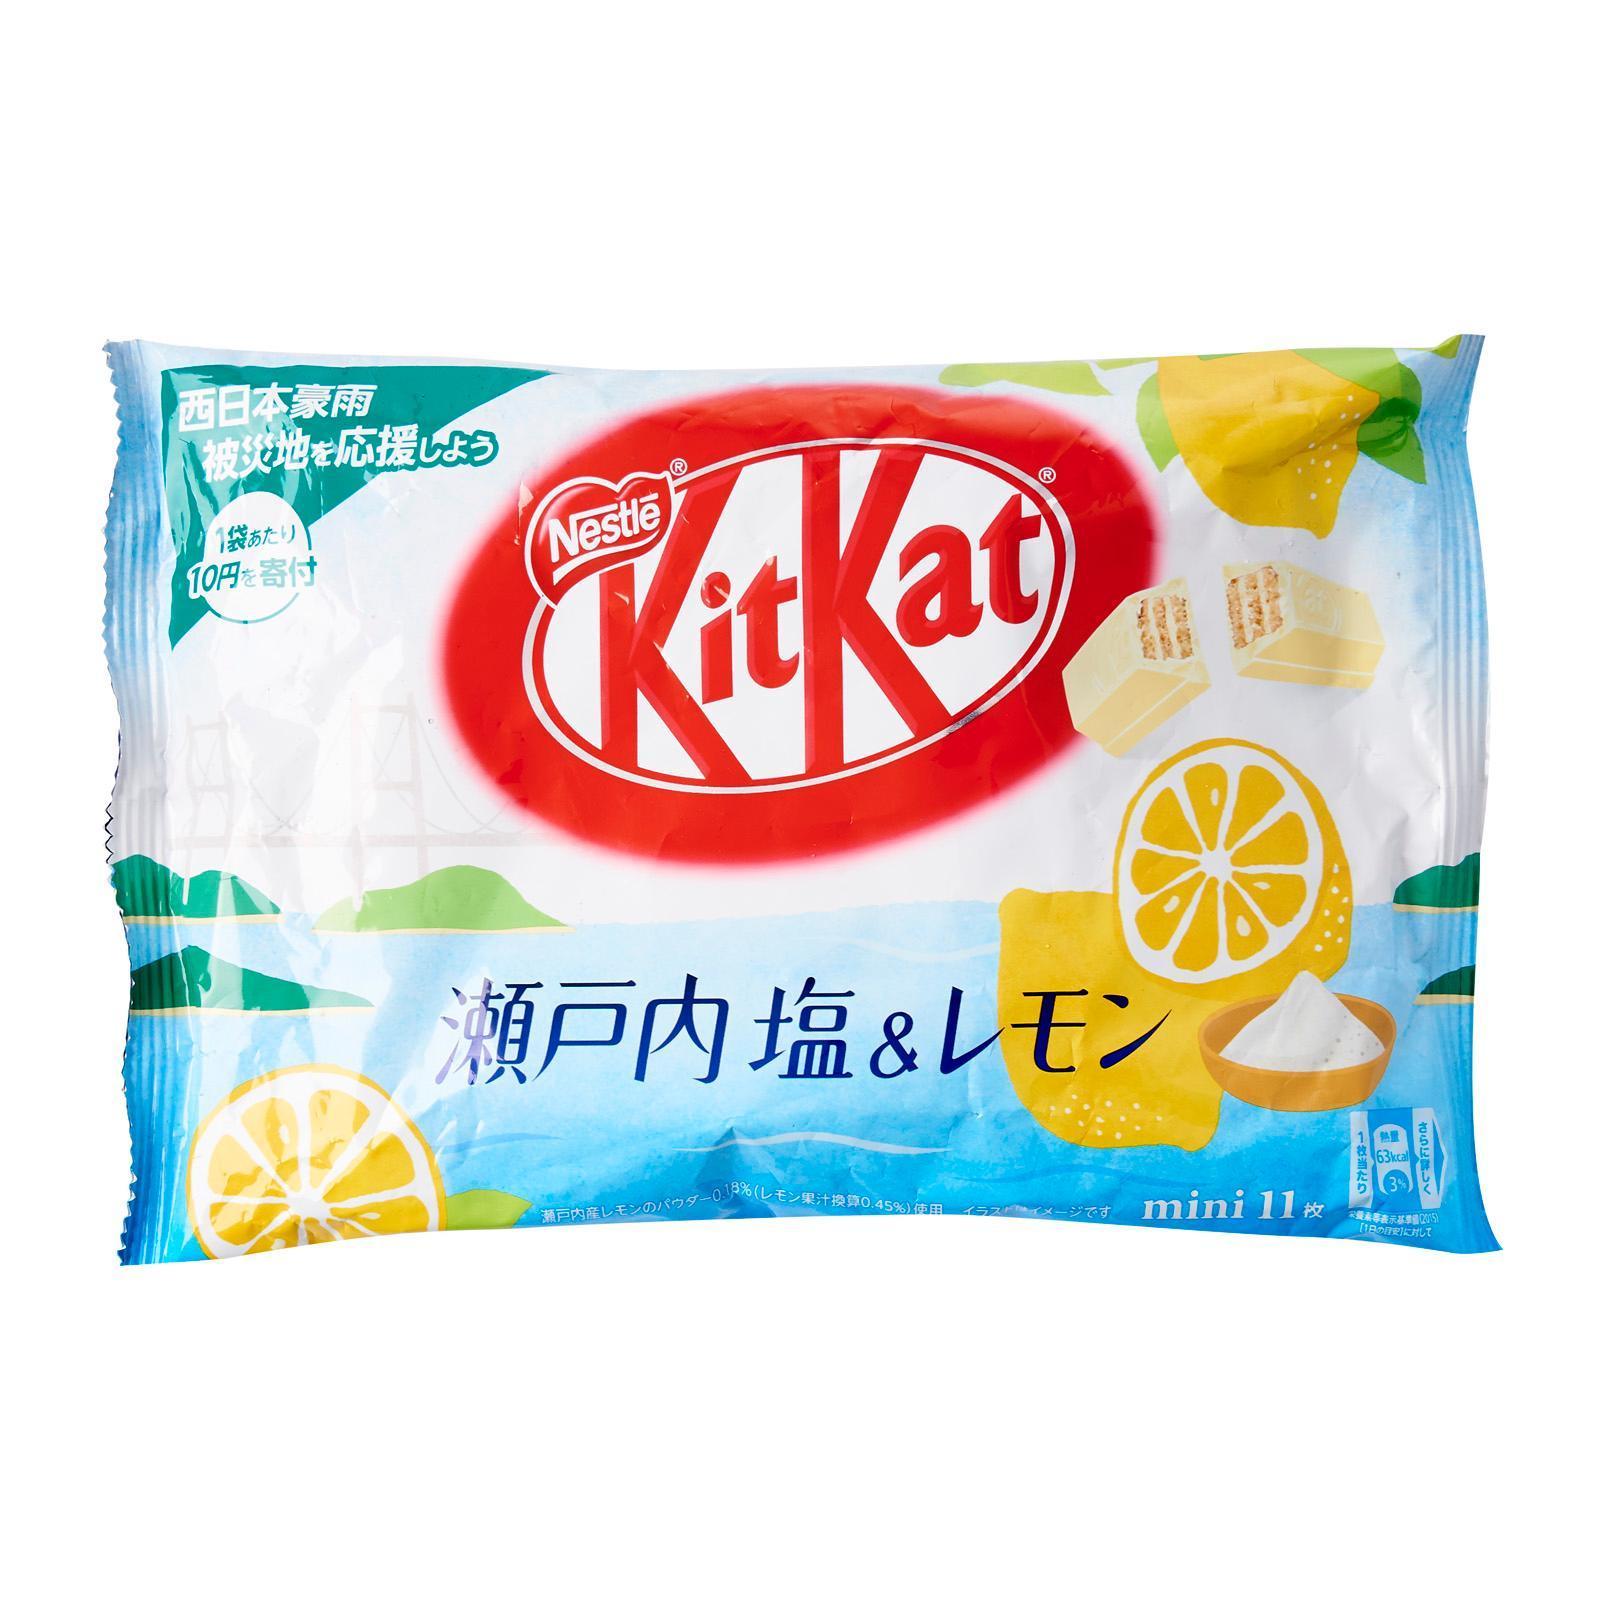 Nestle Kit Kat Setouchi Salty Lemon Flavour Mini Chocolate